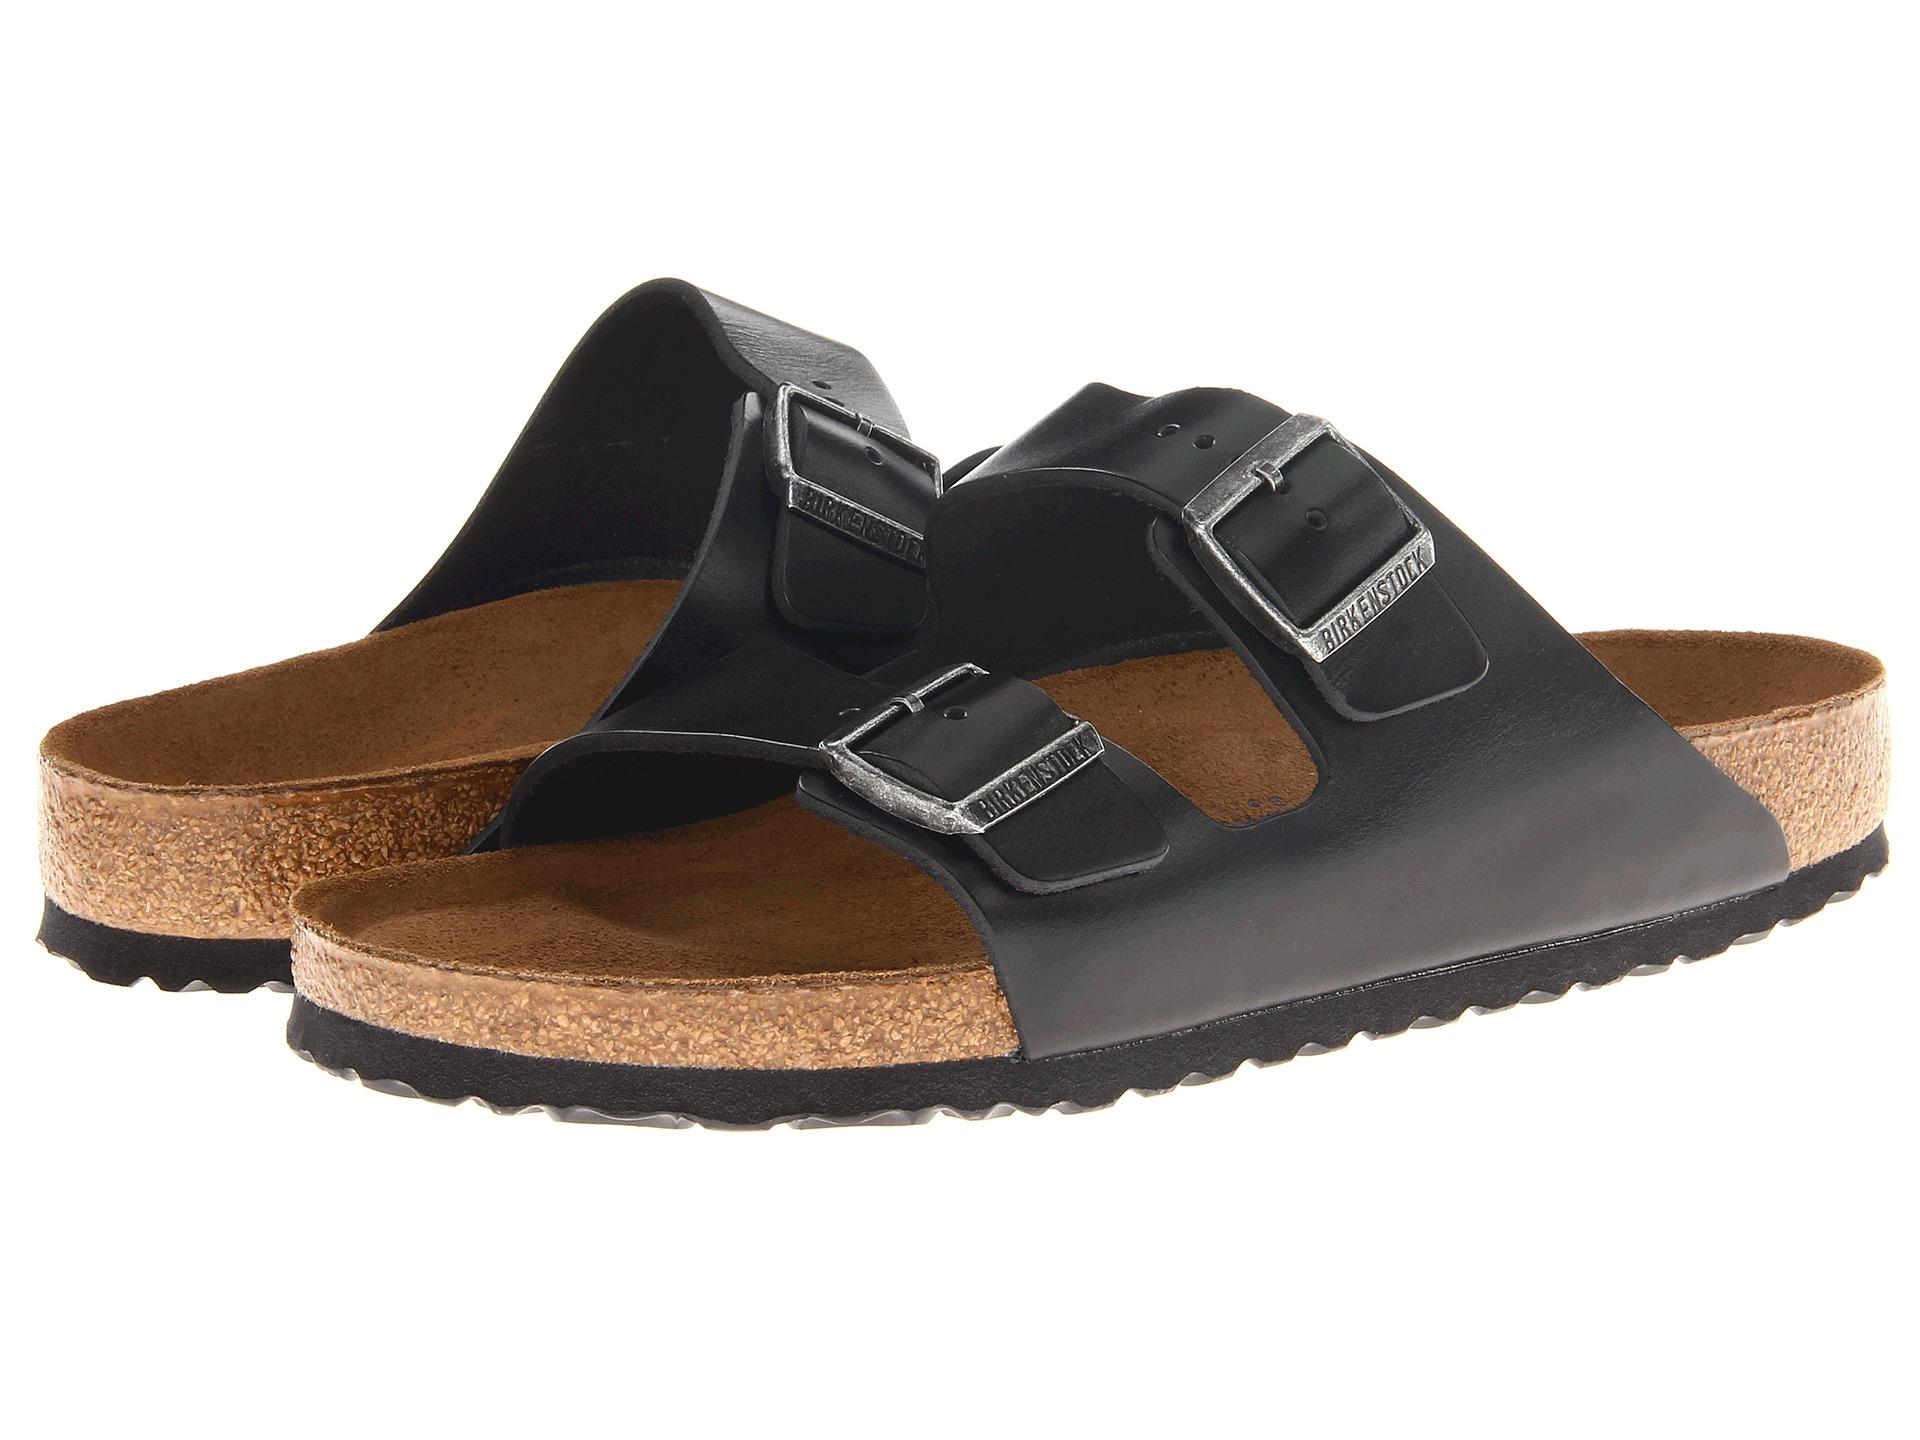 Birkenstock Arizona Soft Footbed Leather Unisex At